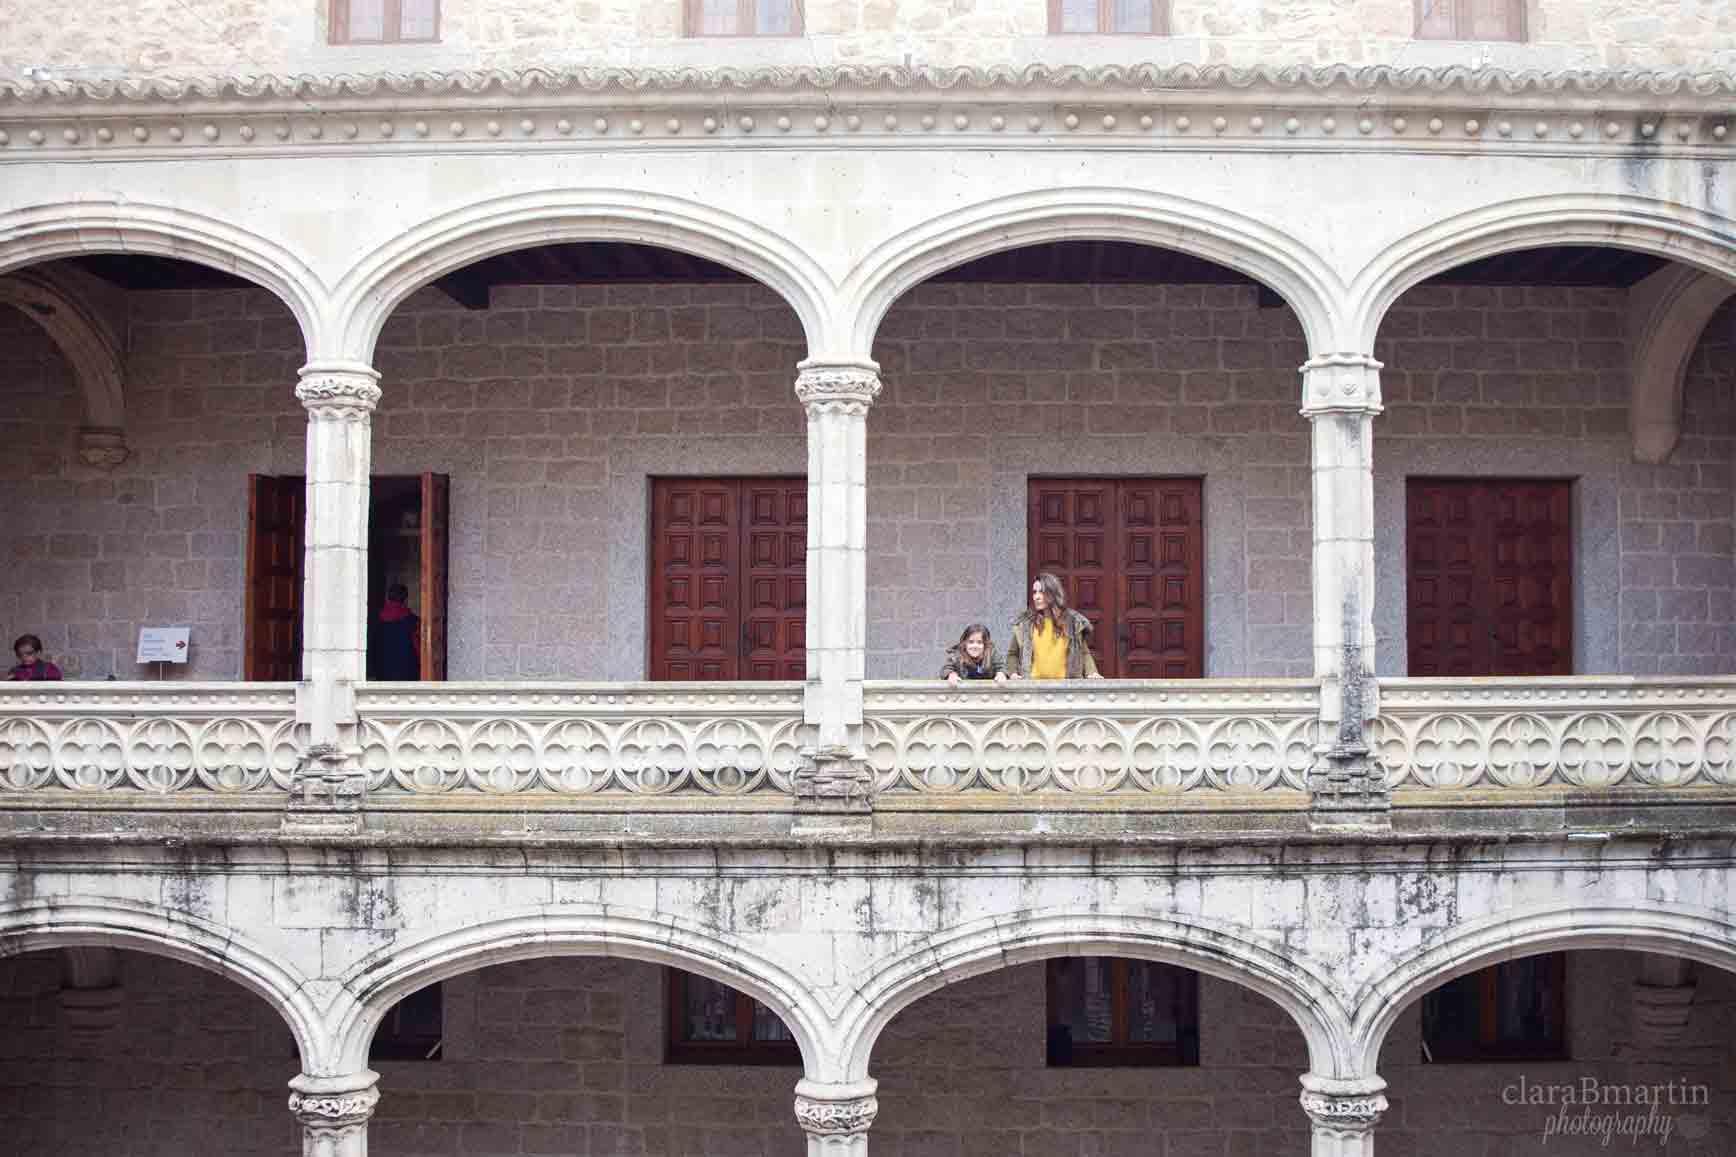 Castillo-Manzanares-El-Real-claraBmartin-04